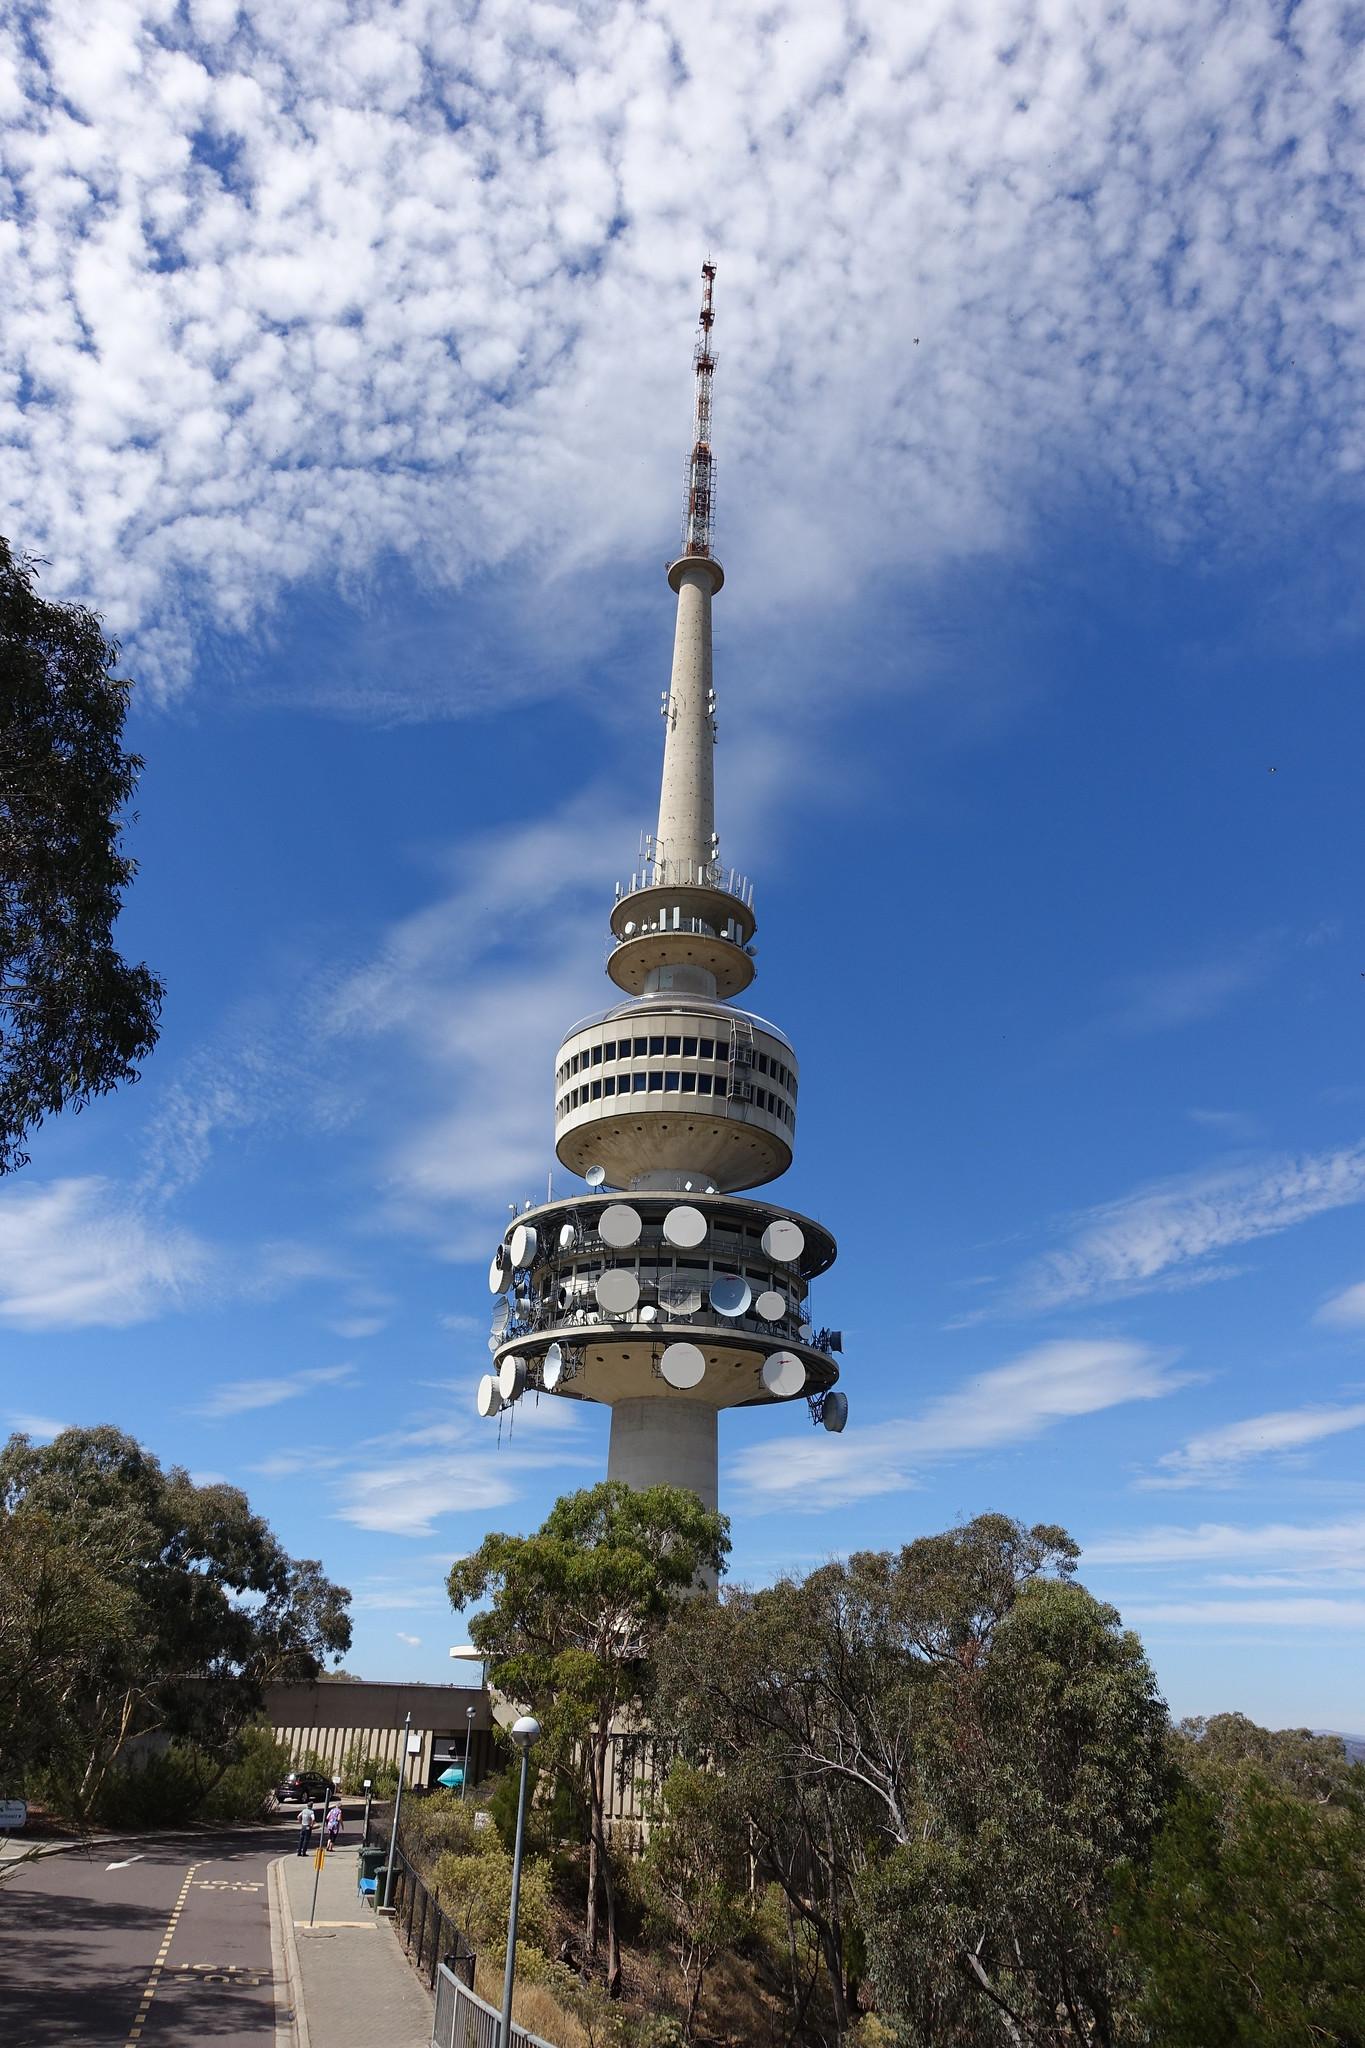 The Telstra Tower Black Mountain Campervan Finder